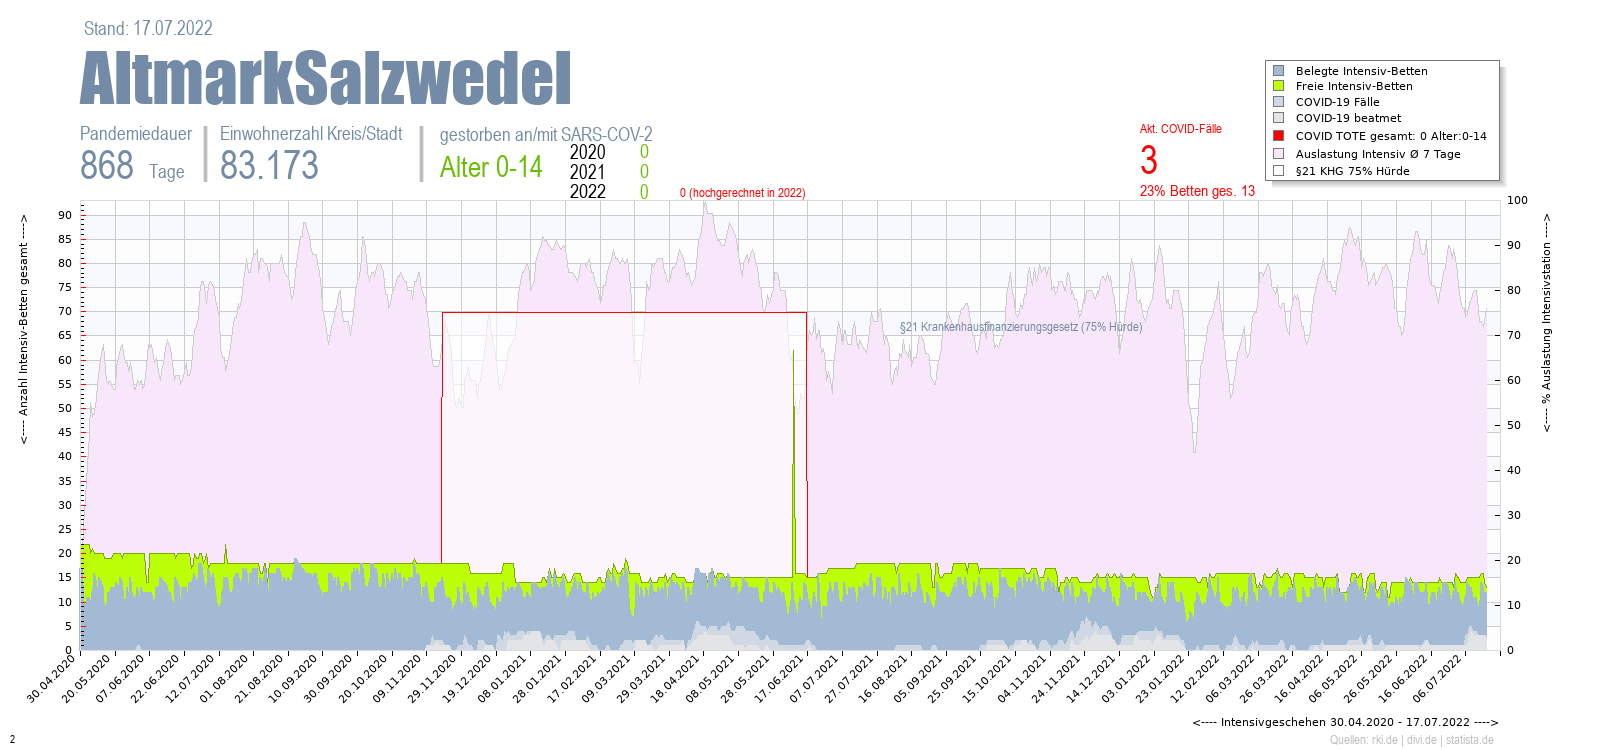 Intensivstation Auslastung AltmarkSalzwedel Alter 0-4